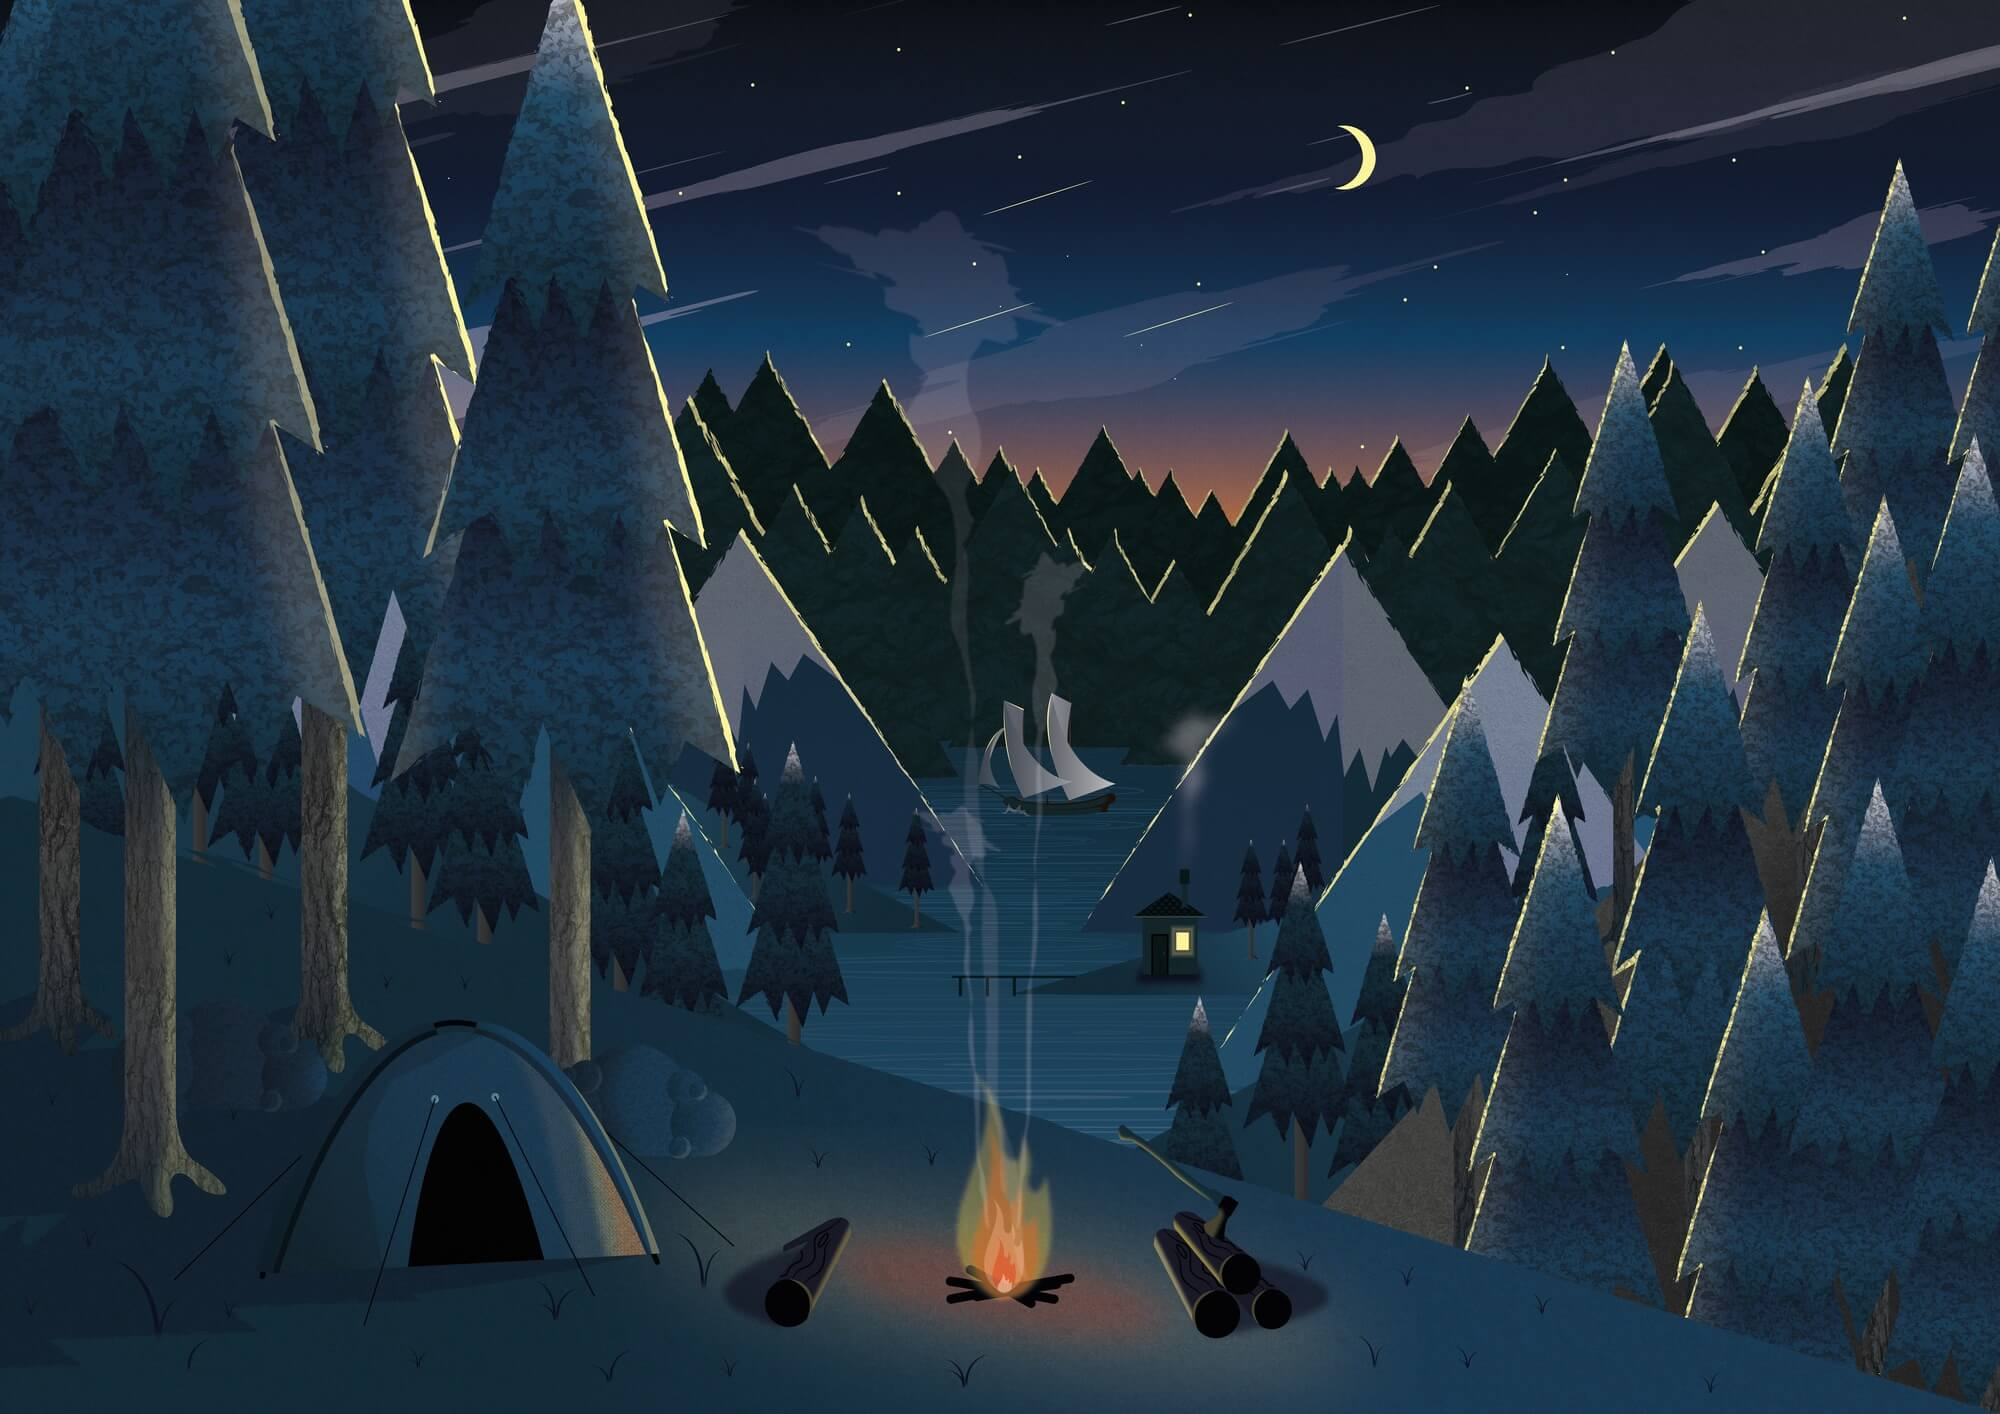 Moonlight Camping Wall Mural